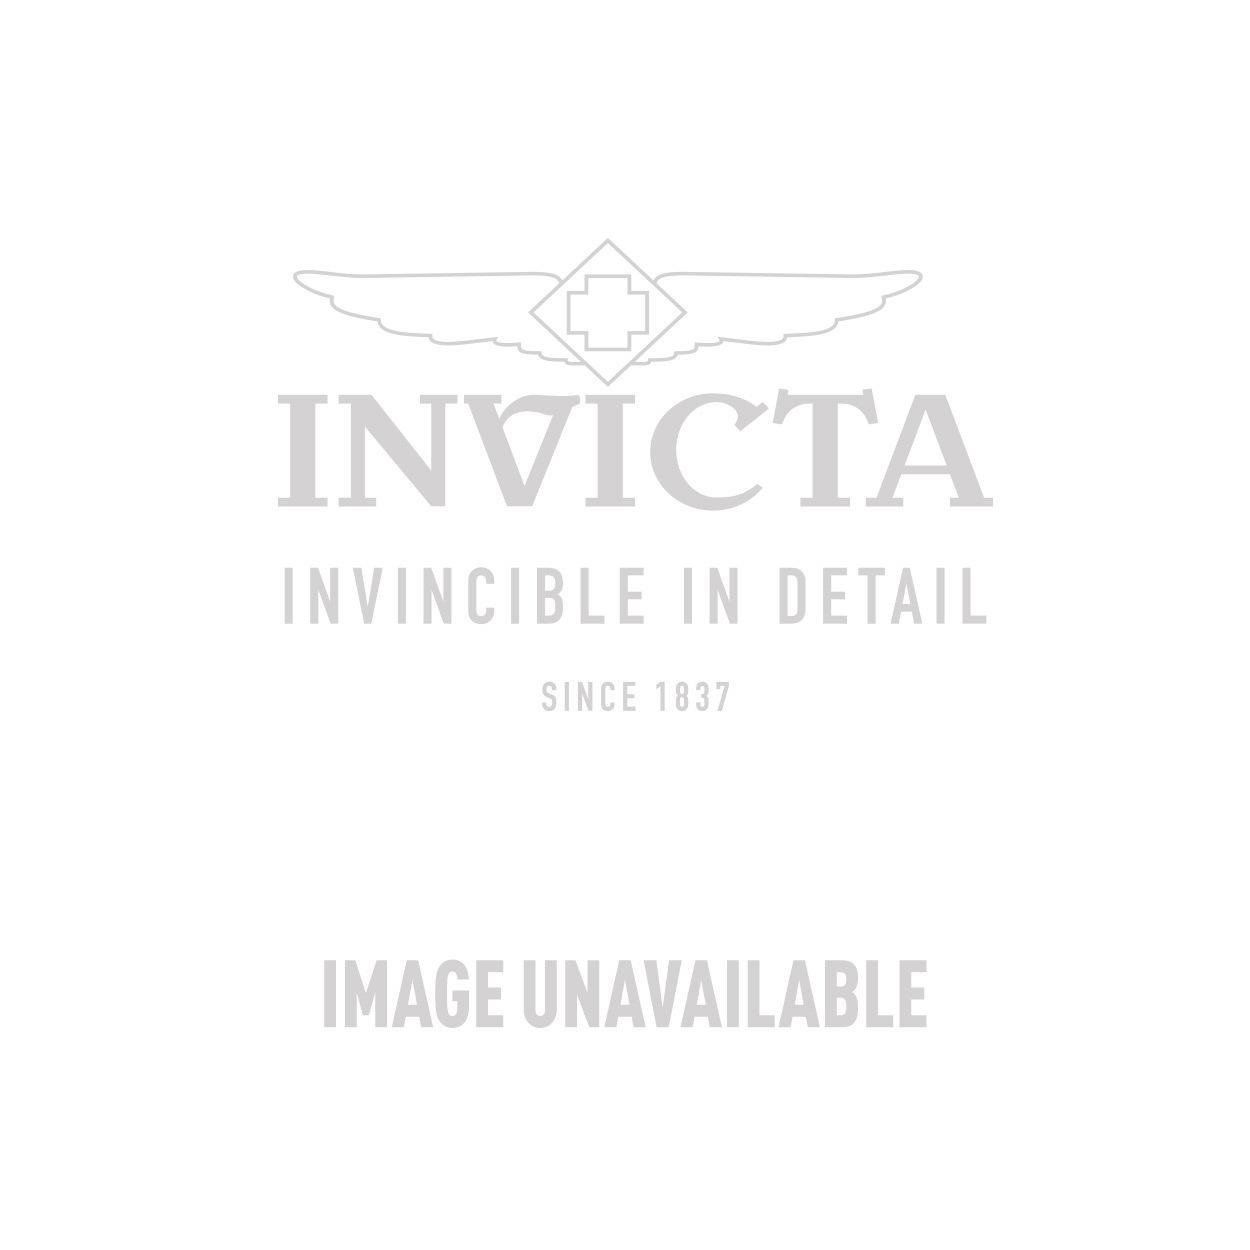 INVICTA Jewelry Divina Bracelets 22 7.9 Silver 925 Yellow Gold - Model J0028